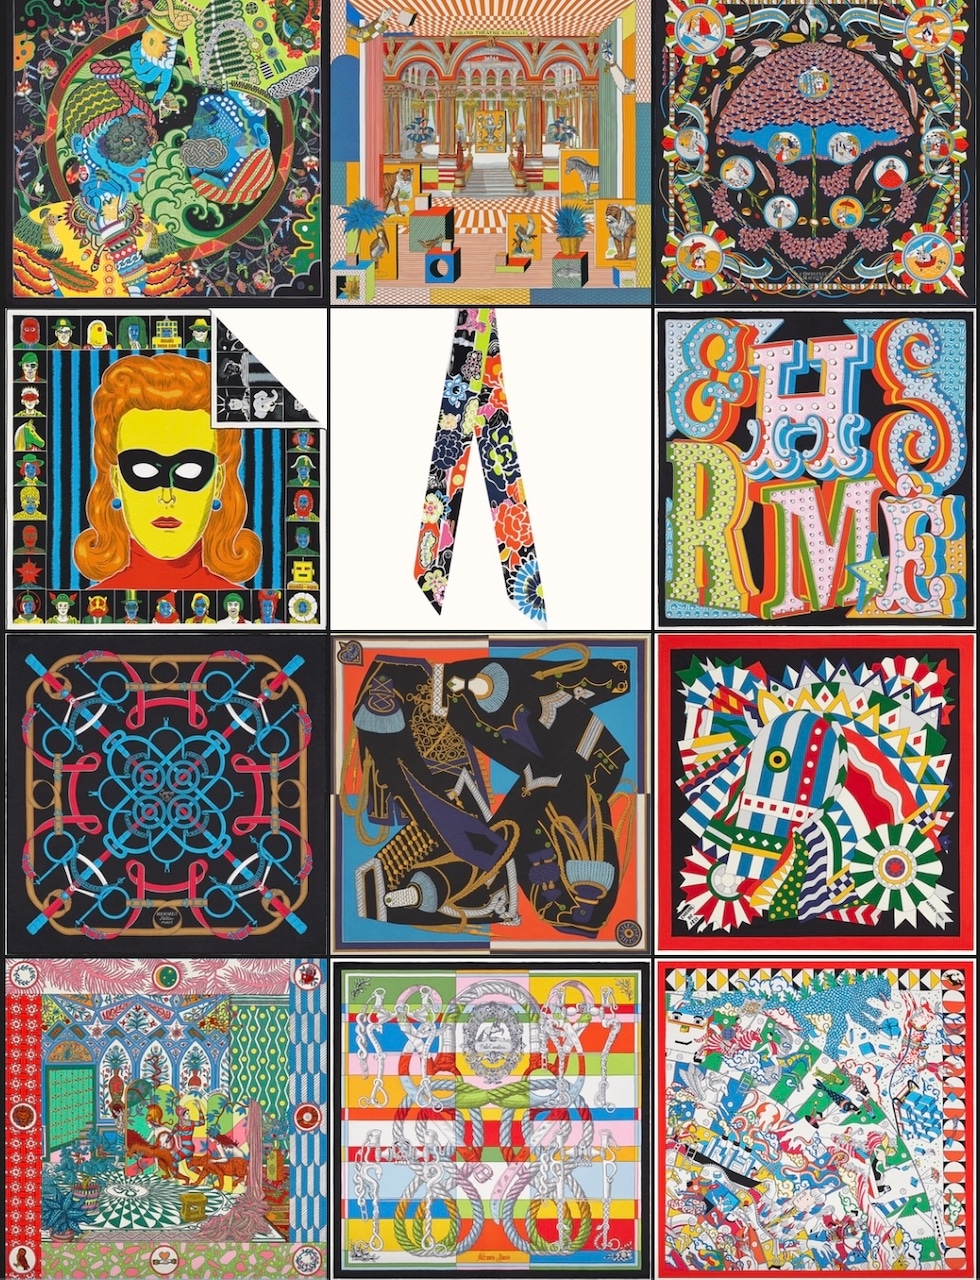 Top Row: Duo Cosmique scarf 90, Grand Theatre Nouveau scarf 90, L'Ombrelle Magique shawl 140. Second Row: Dress Code double face scarf 90, Bingata twilly, Hermes Electrique scarf 45. Third Row: Eperon d'Or shawl 140, Zouaves et Dragons wash scarf 90, Cheval de Fete shawl 140. Bottom Rpw: La Danse des Amazones shawl 140, Della Cavalleria scarf 45, L'Epopee d'Hermes Detail scarf 70. Photos via Hermes.com